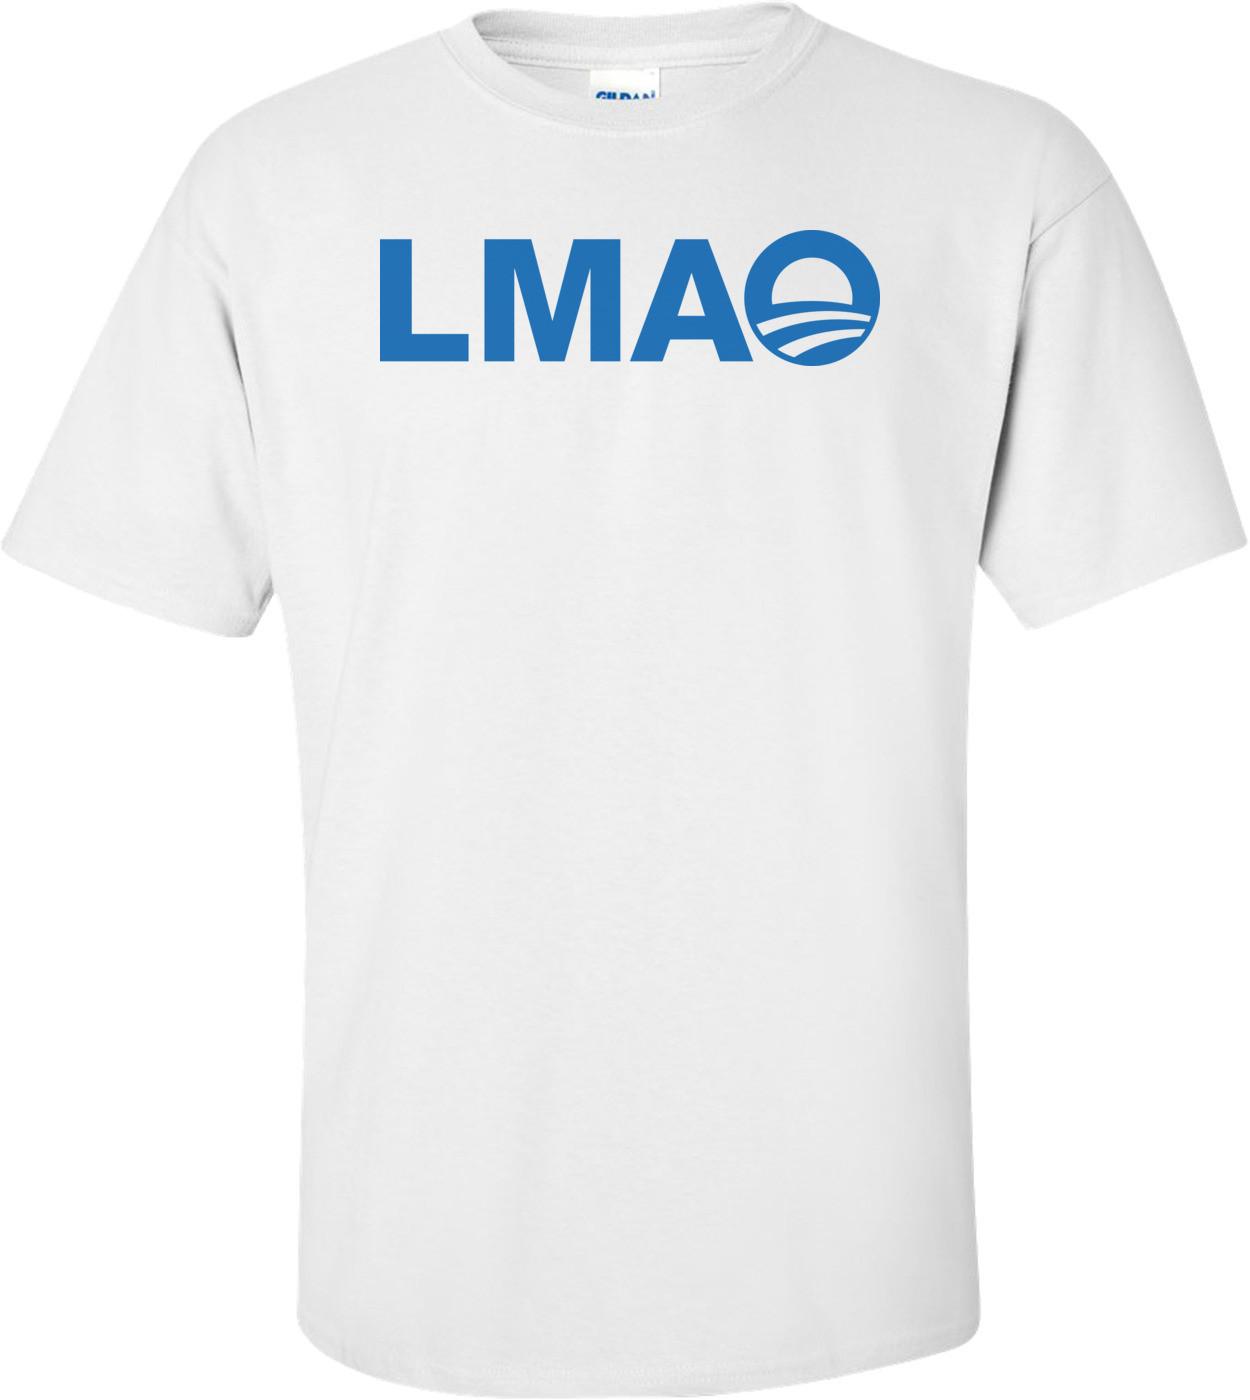 Lmao Obama T-Shirt